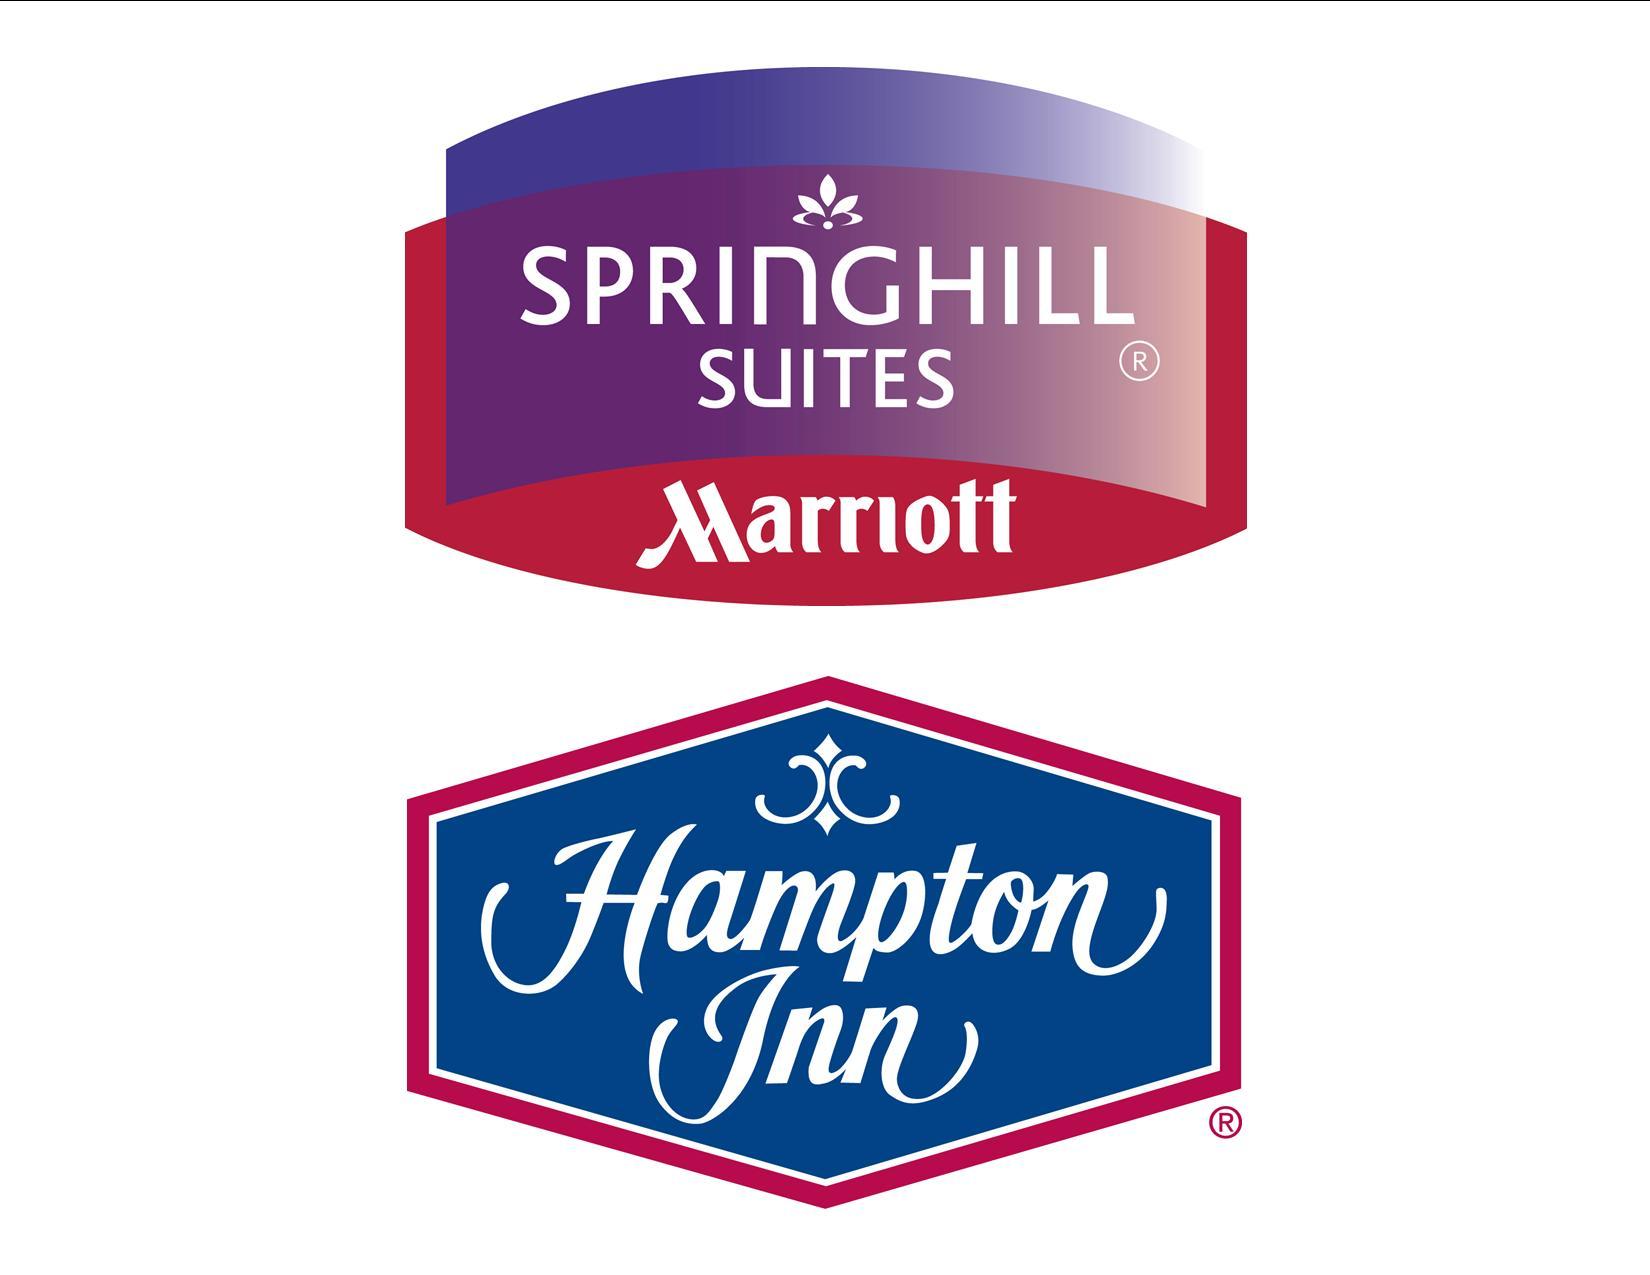 SpringHill Suites by Marriott/ Hampton Inn by Hilton